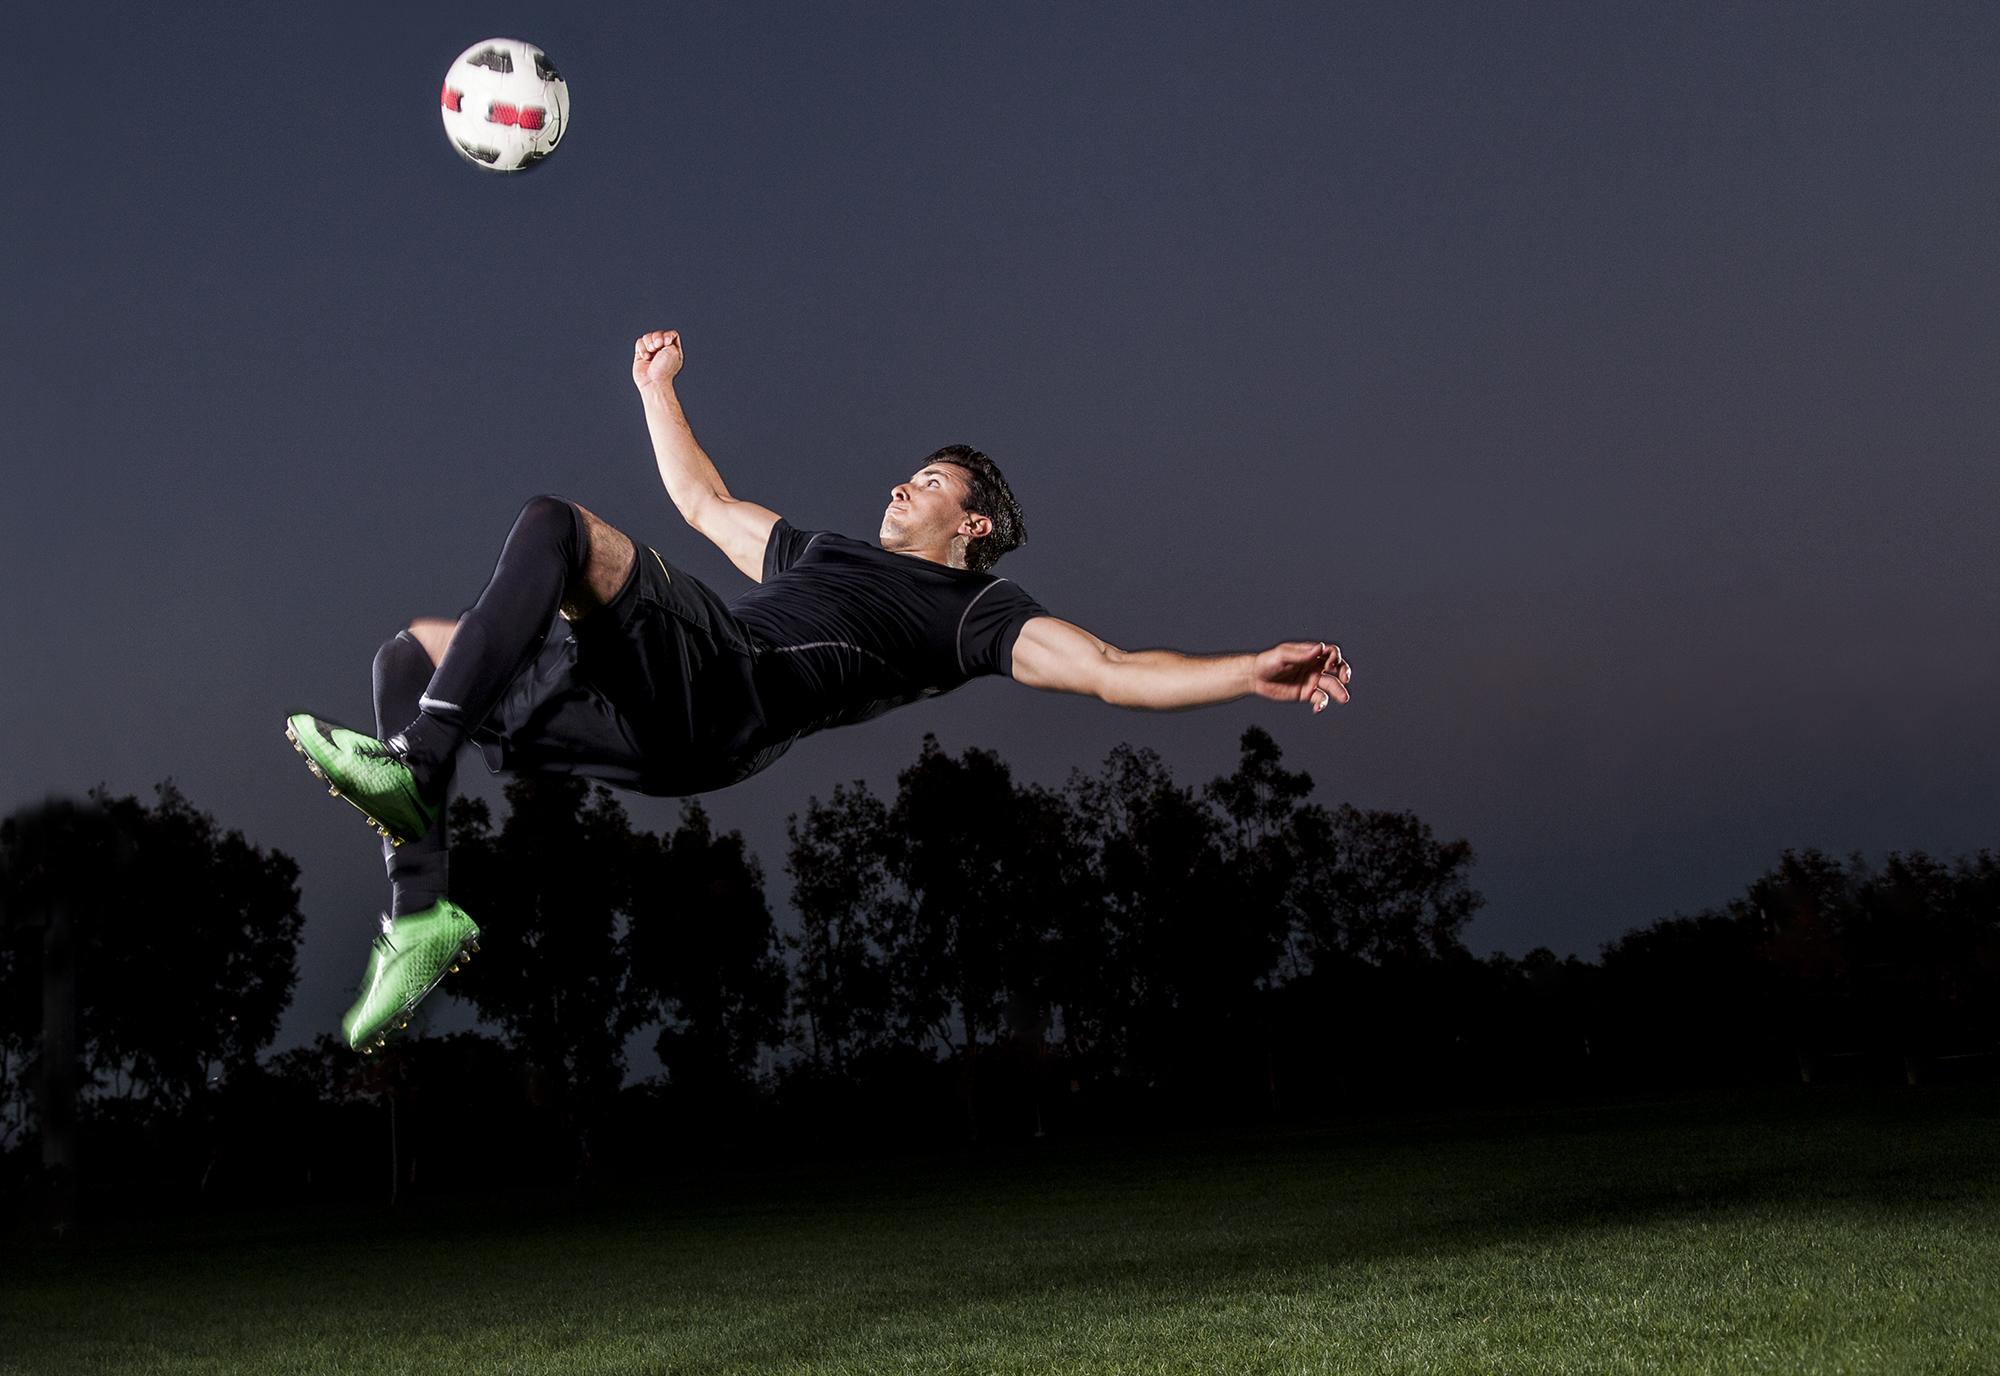 Twan soccer portraits 189 2000px.jpg